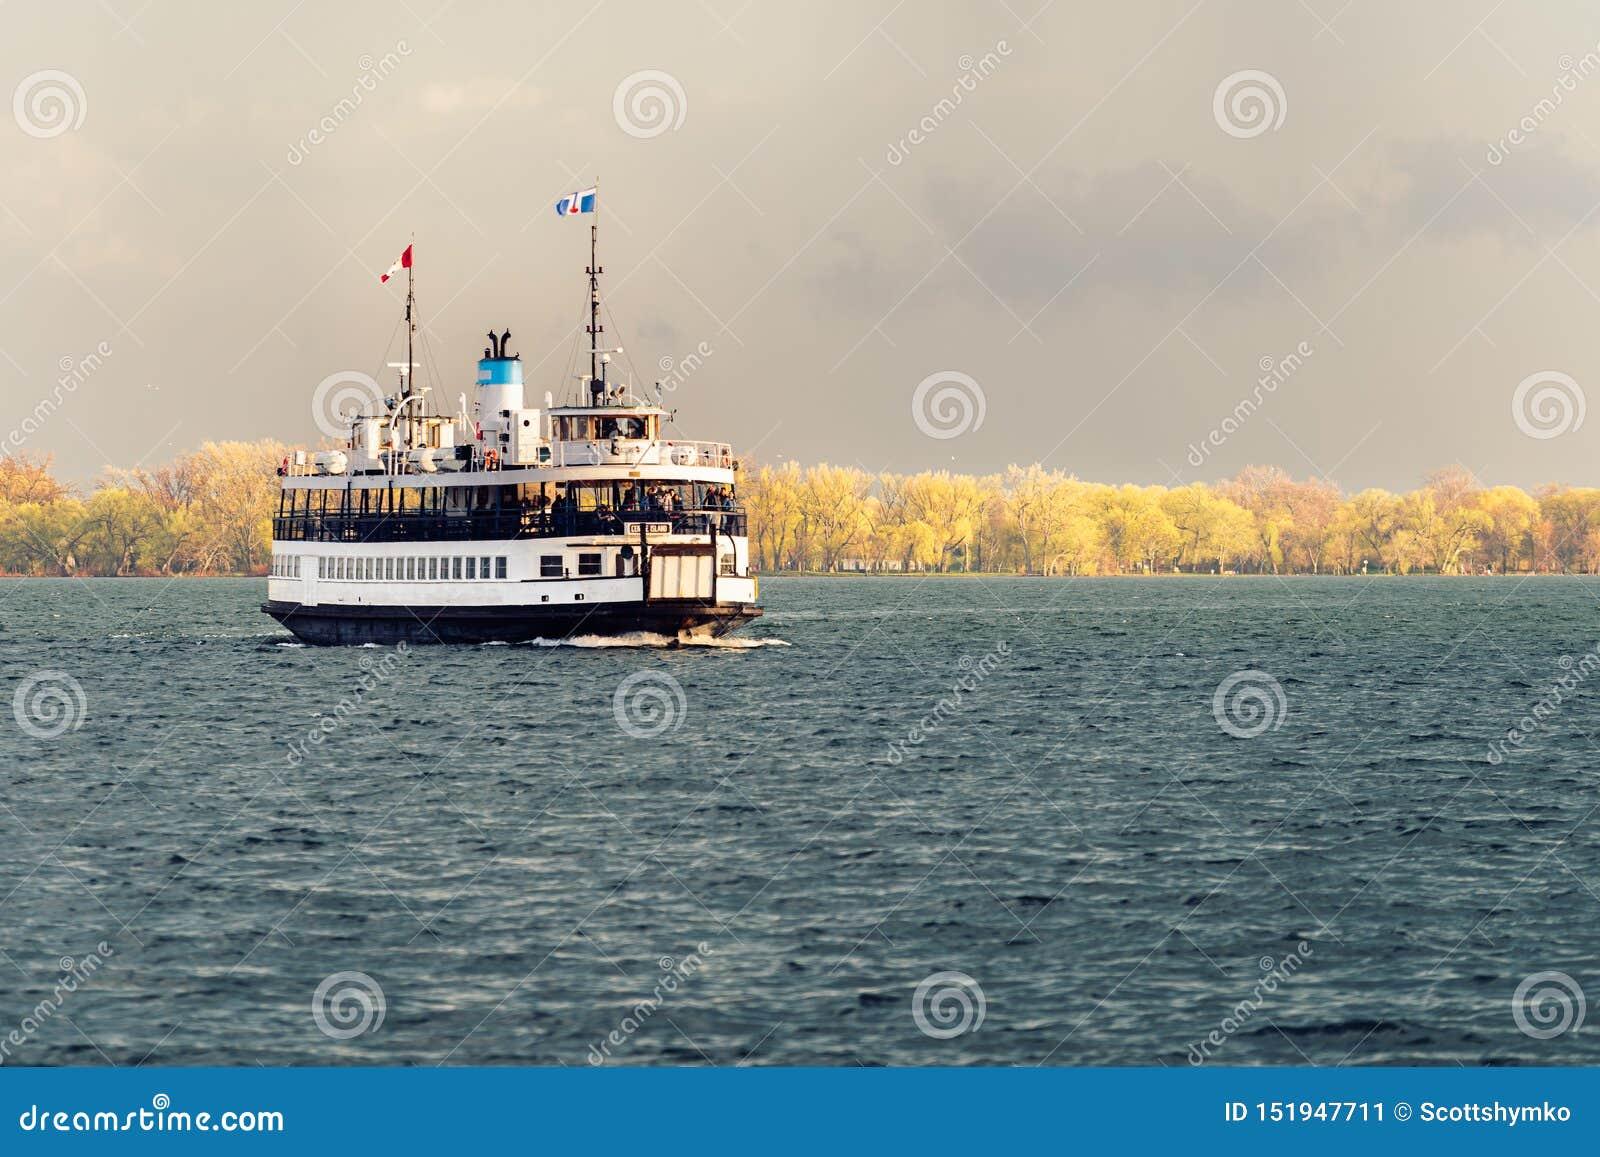 Пассажирский паром плавает через гавань Торонто после шторма